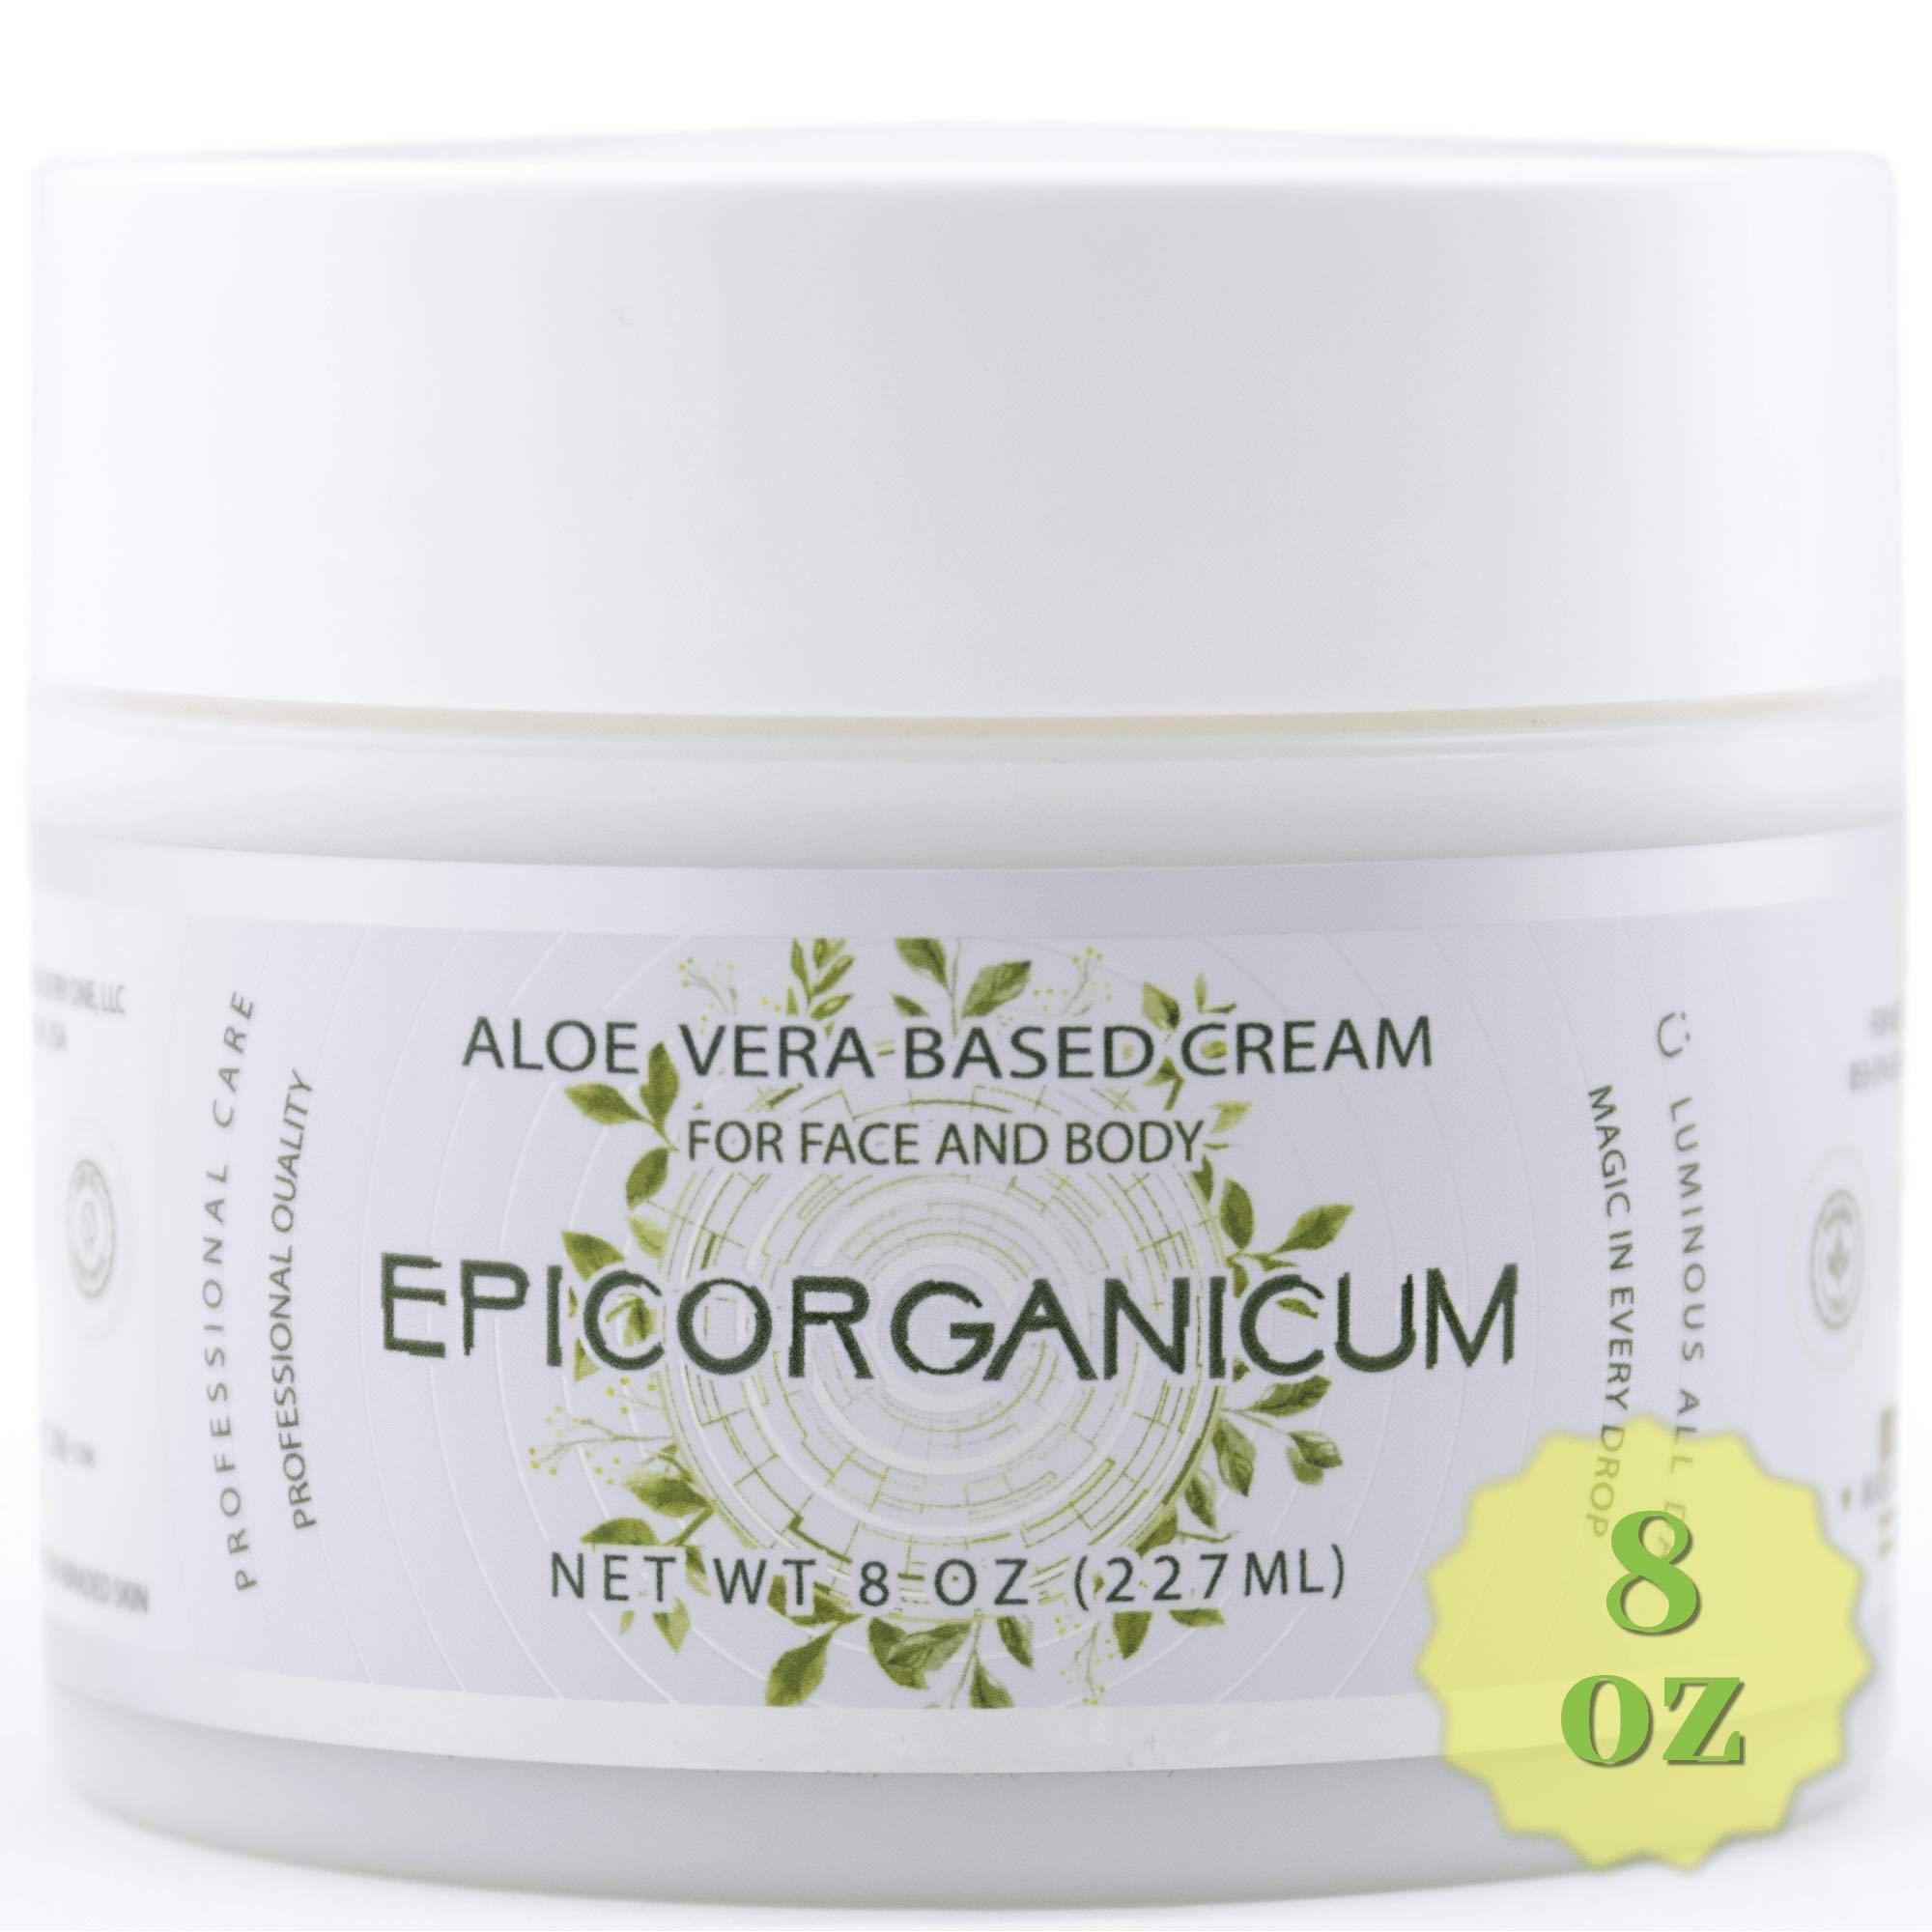 Organic Aloe Vera Moisturizing Cream Body and Face Moisturizer For Acne, Psoriasis, Rosacea, Eczema, Aging, Itchy Dry or Sensitive Skin Care Cream, 8 oz Skin Care Face Natural Cream (8 OZ) by Epic Organicum